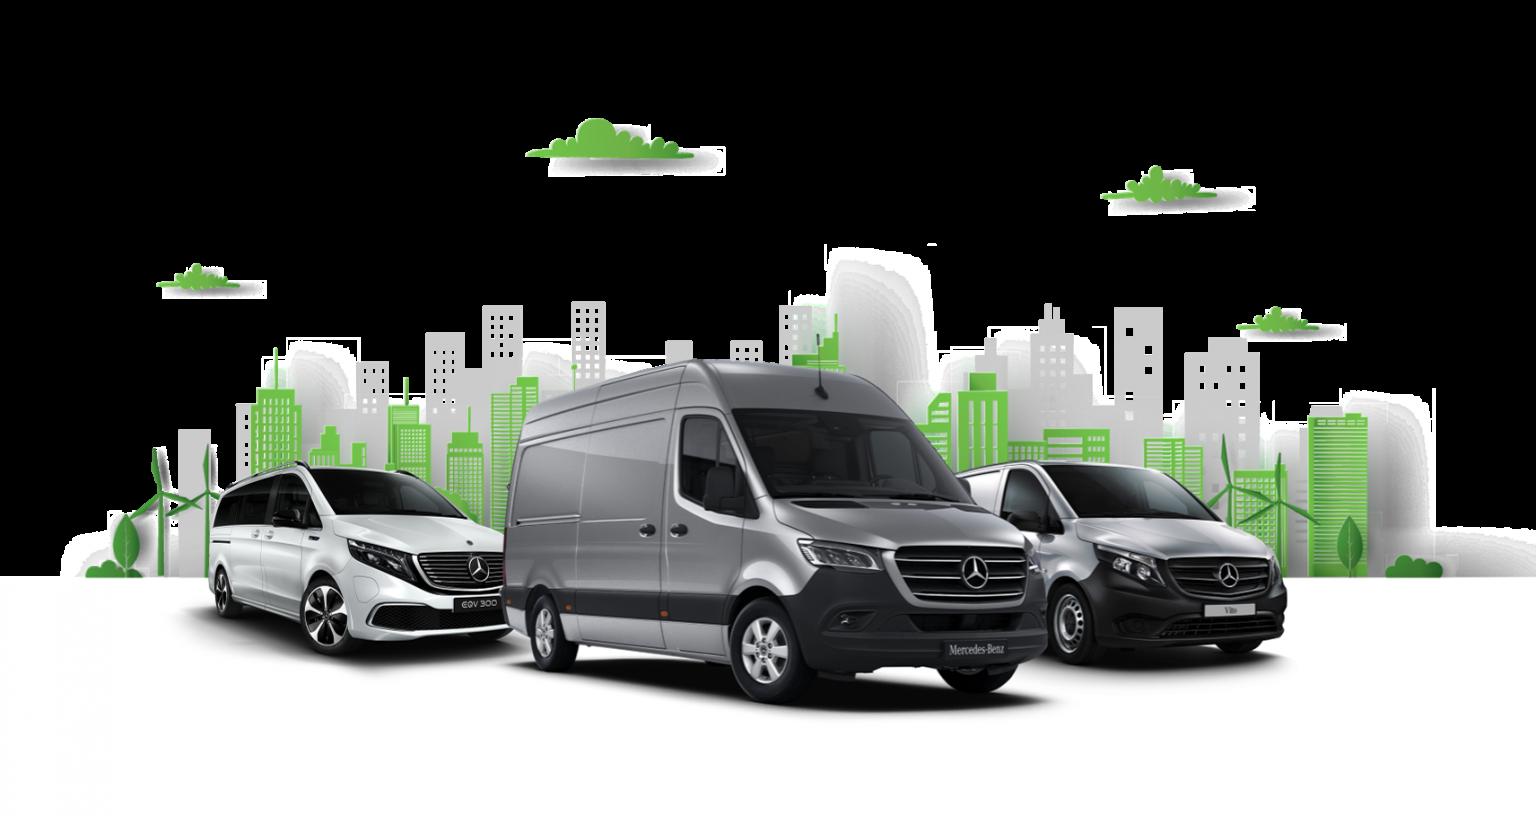 Mercedes-Benz greenzone